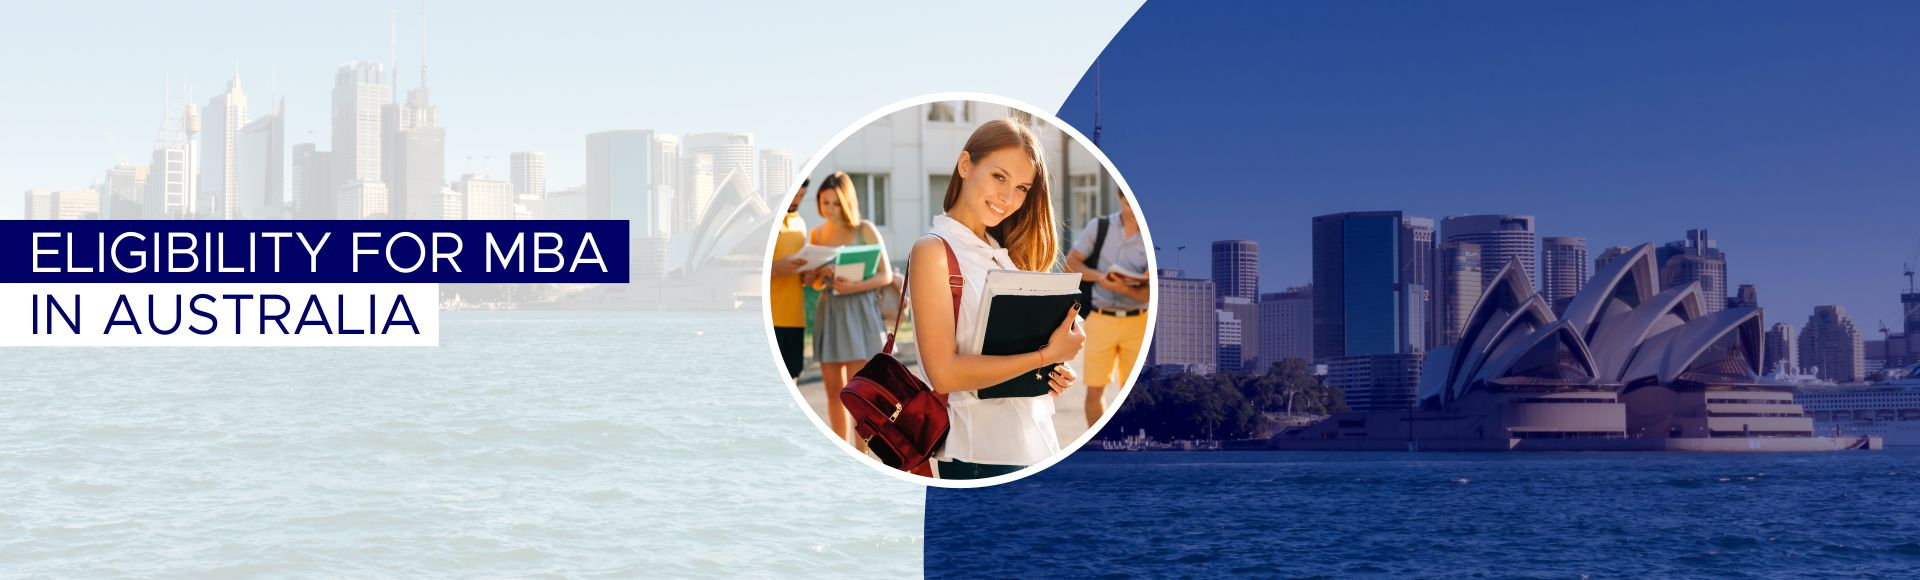 Eligibility for MBA in Australia